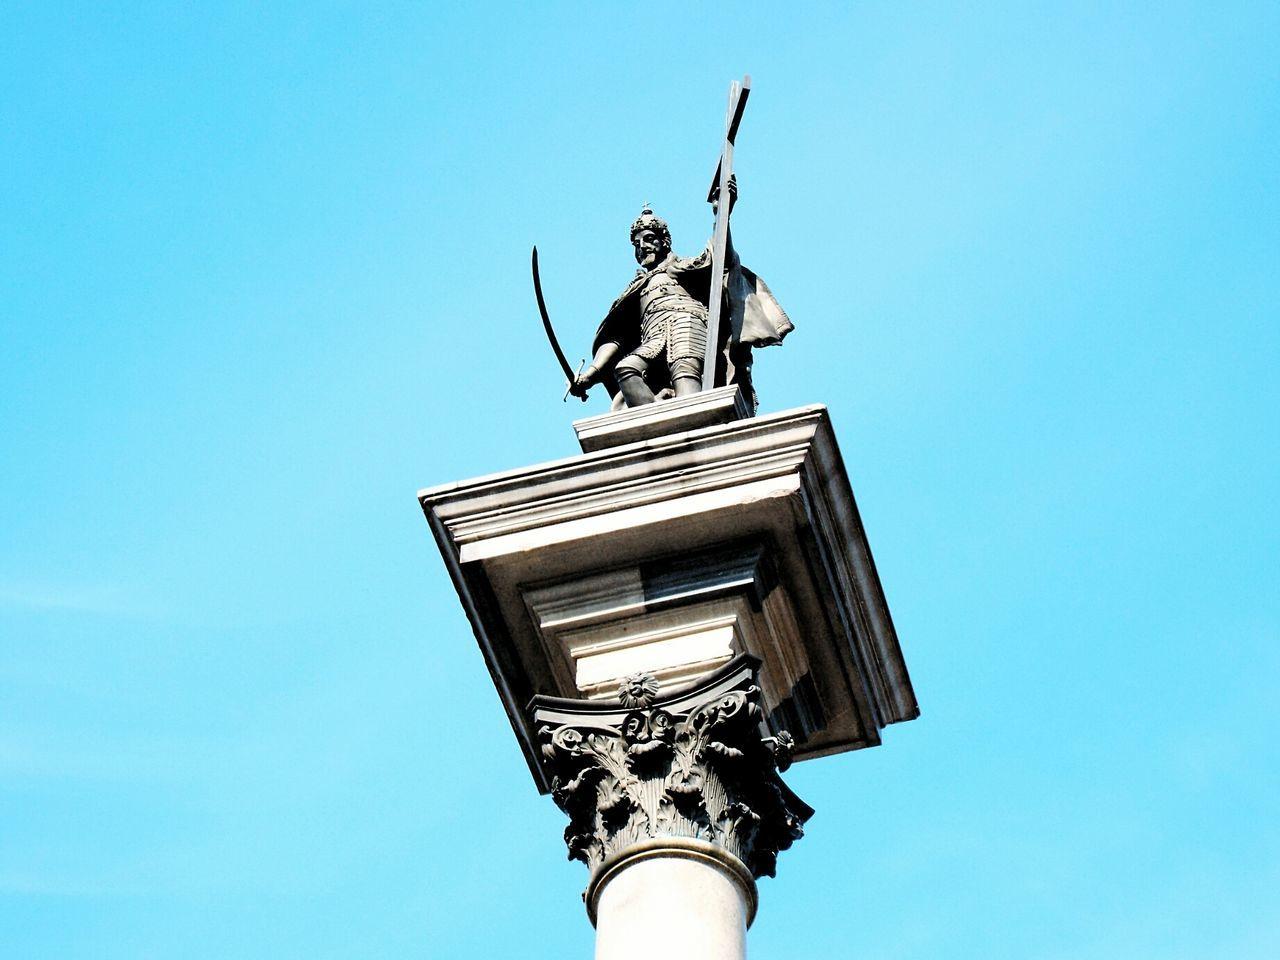 Beautiful stock photos of statue of liberty, Cyan, Historical Monuments, Horizontal Image, Pastel